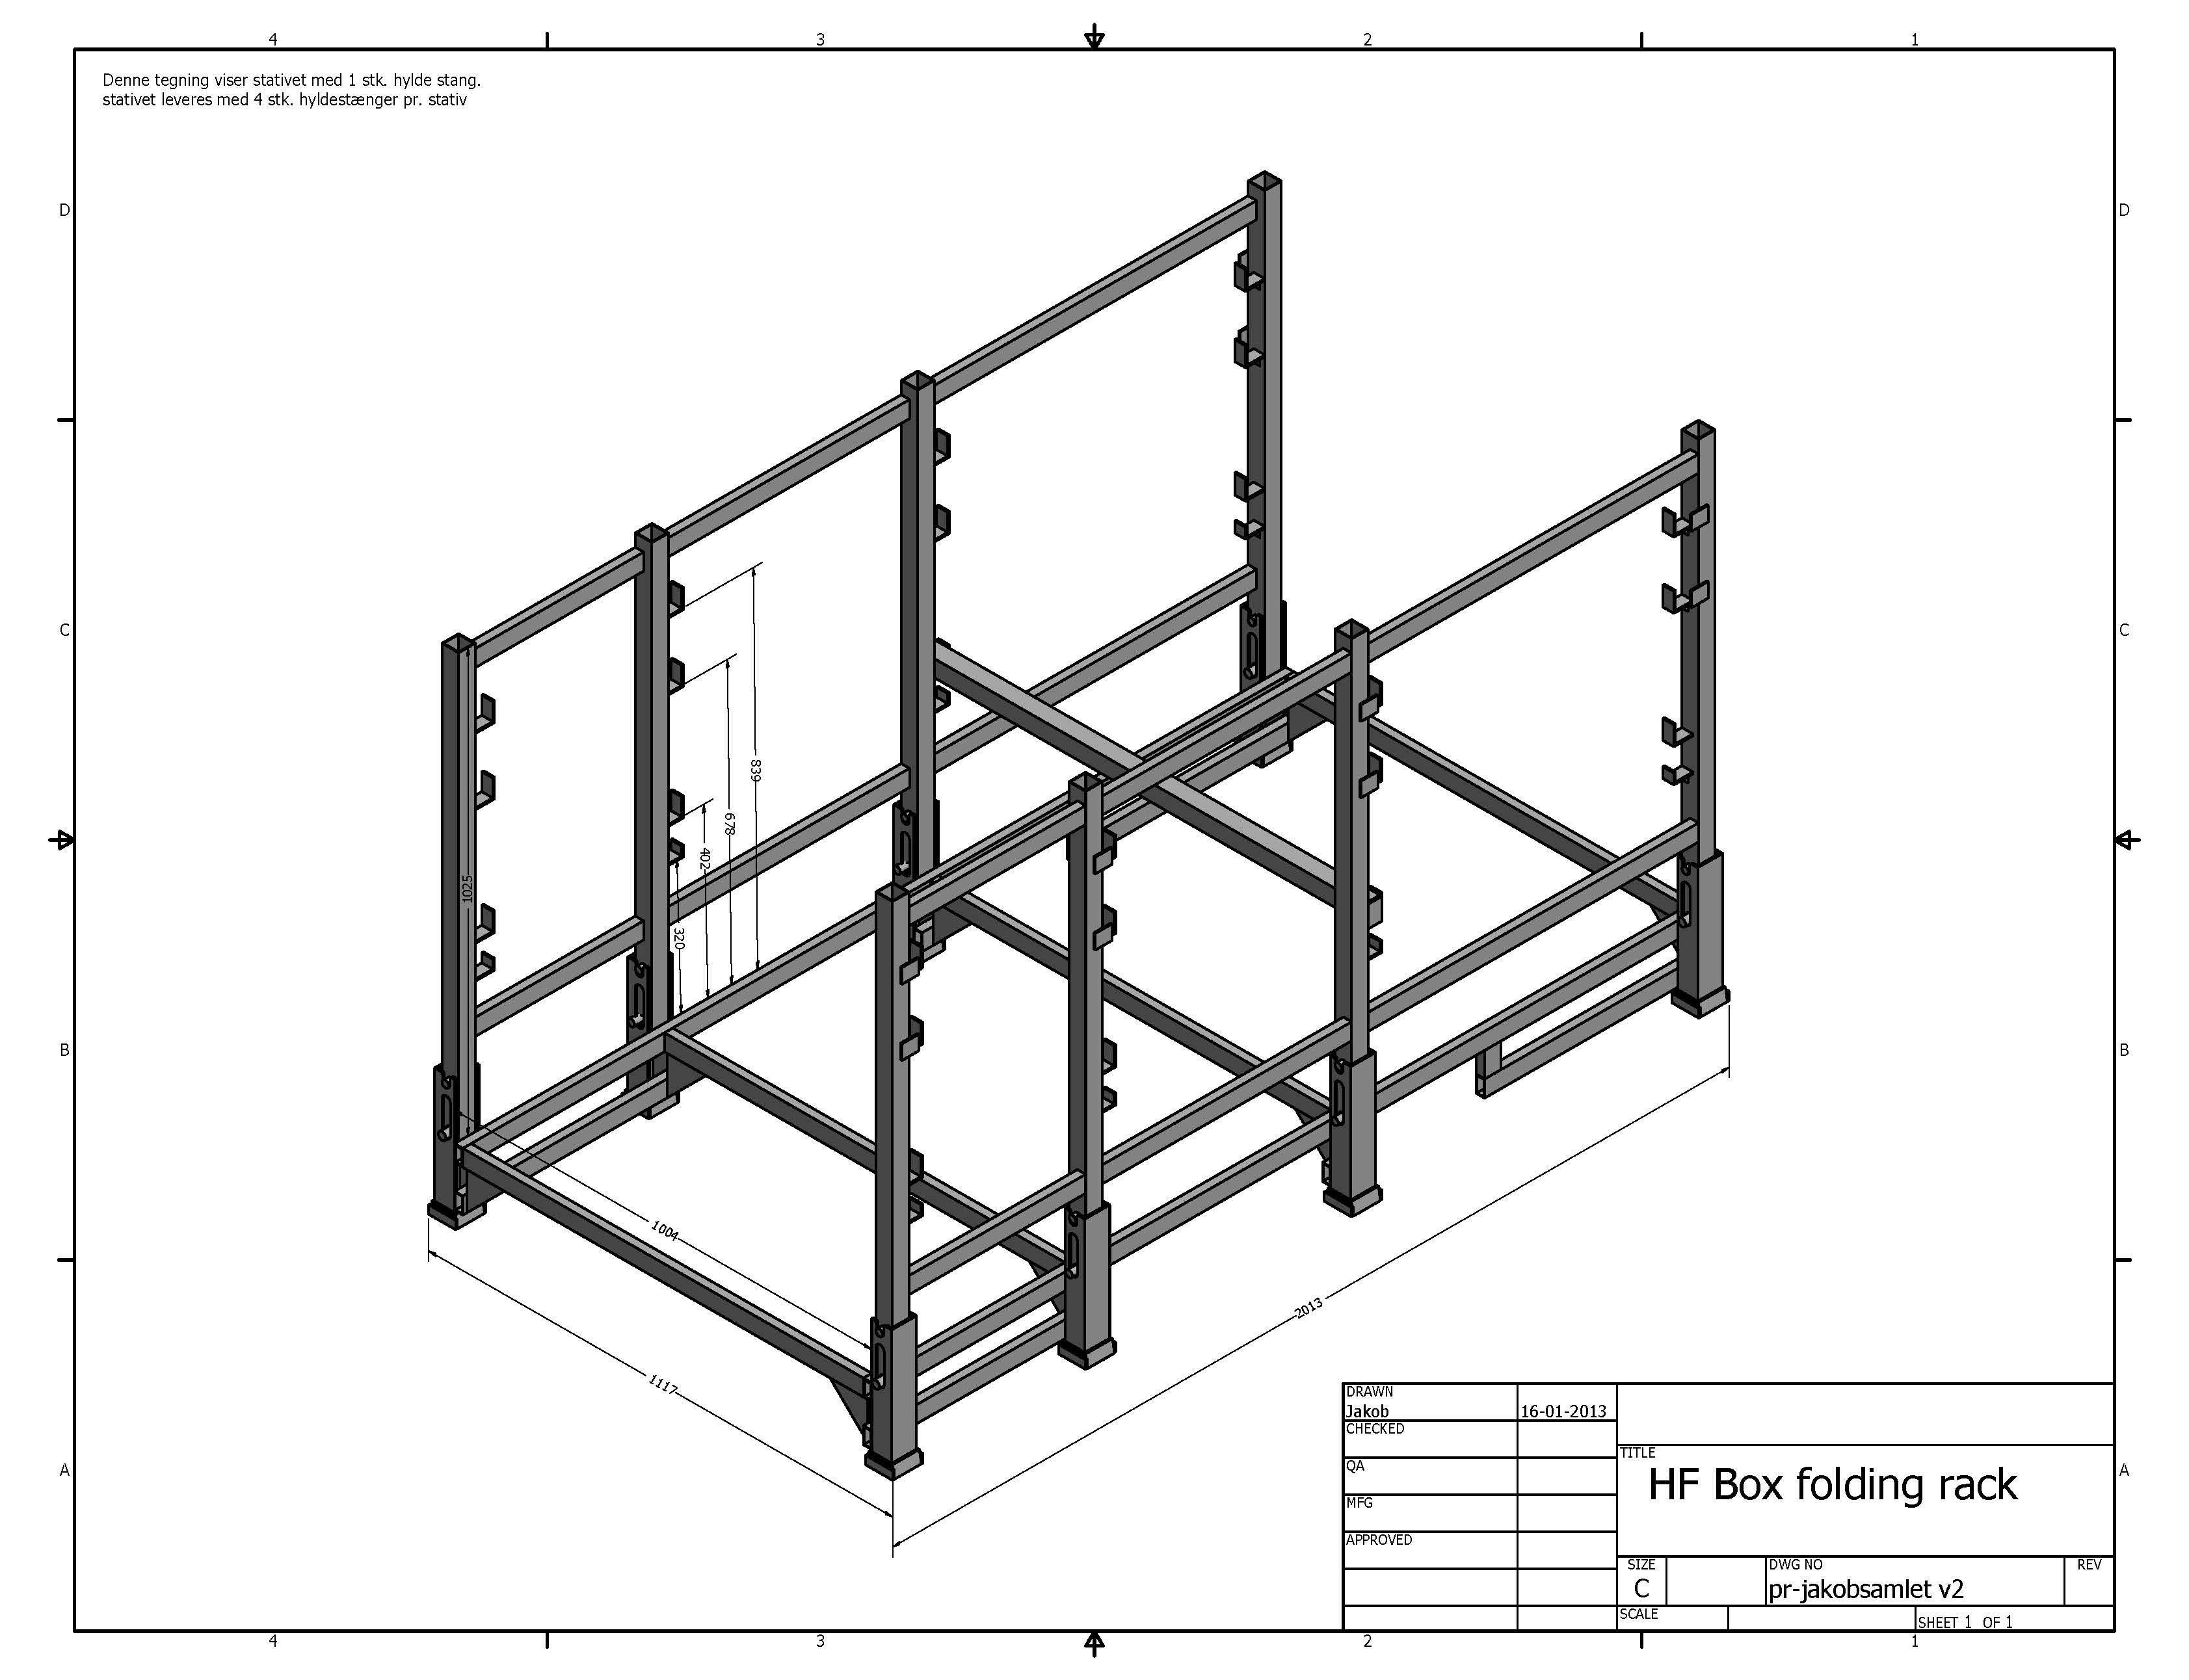 Box folding rack